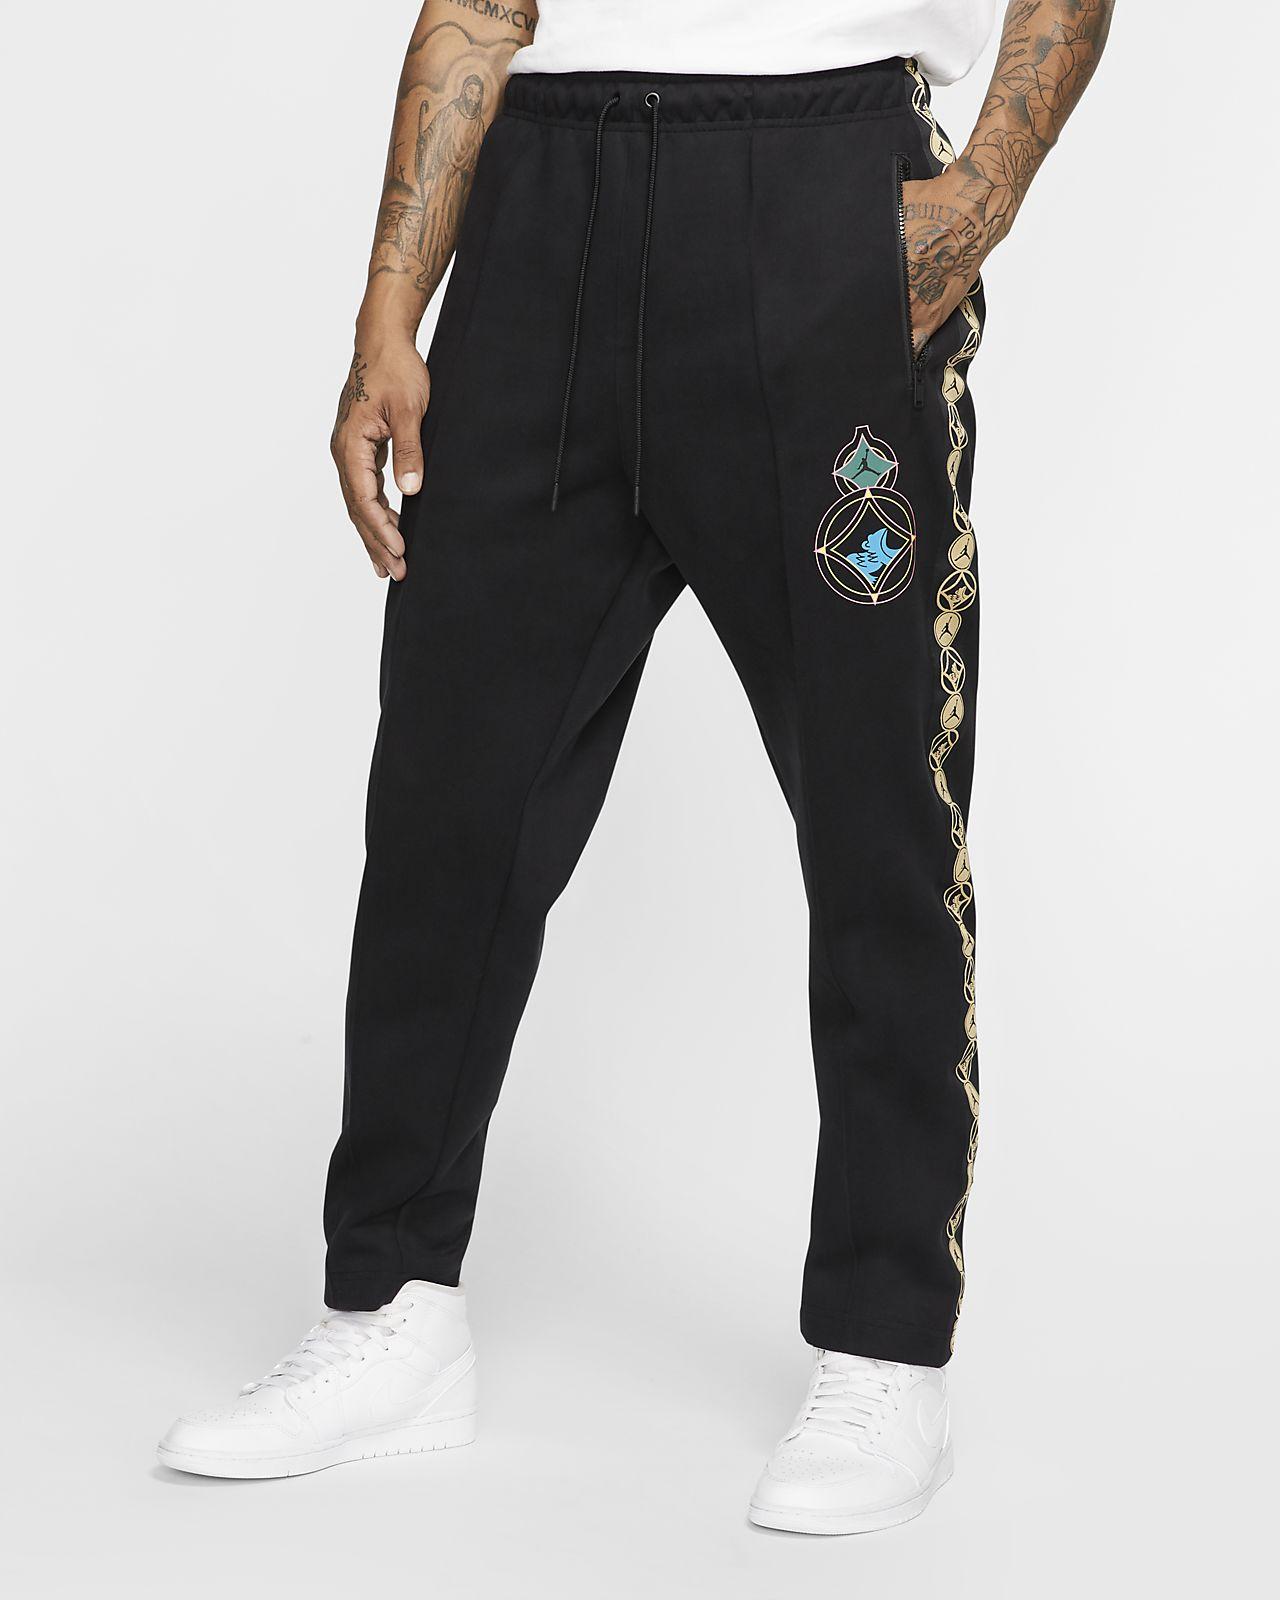 pantaloni nike nylon uomo